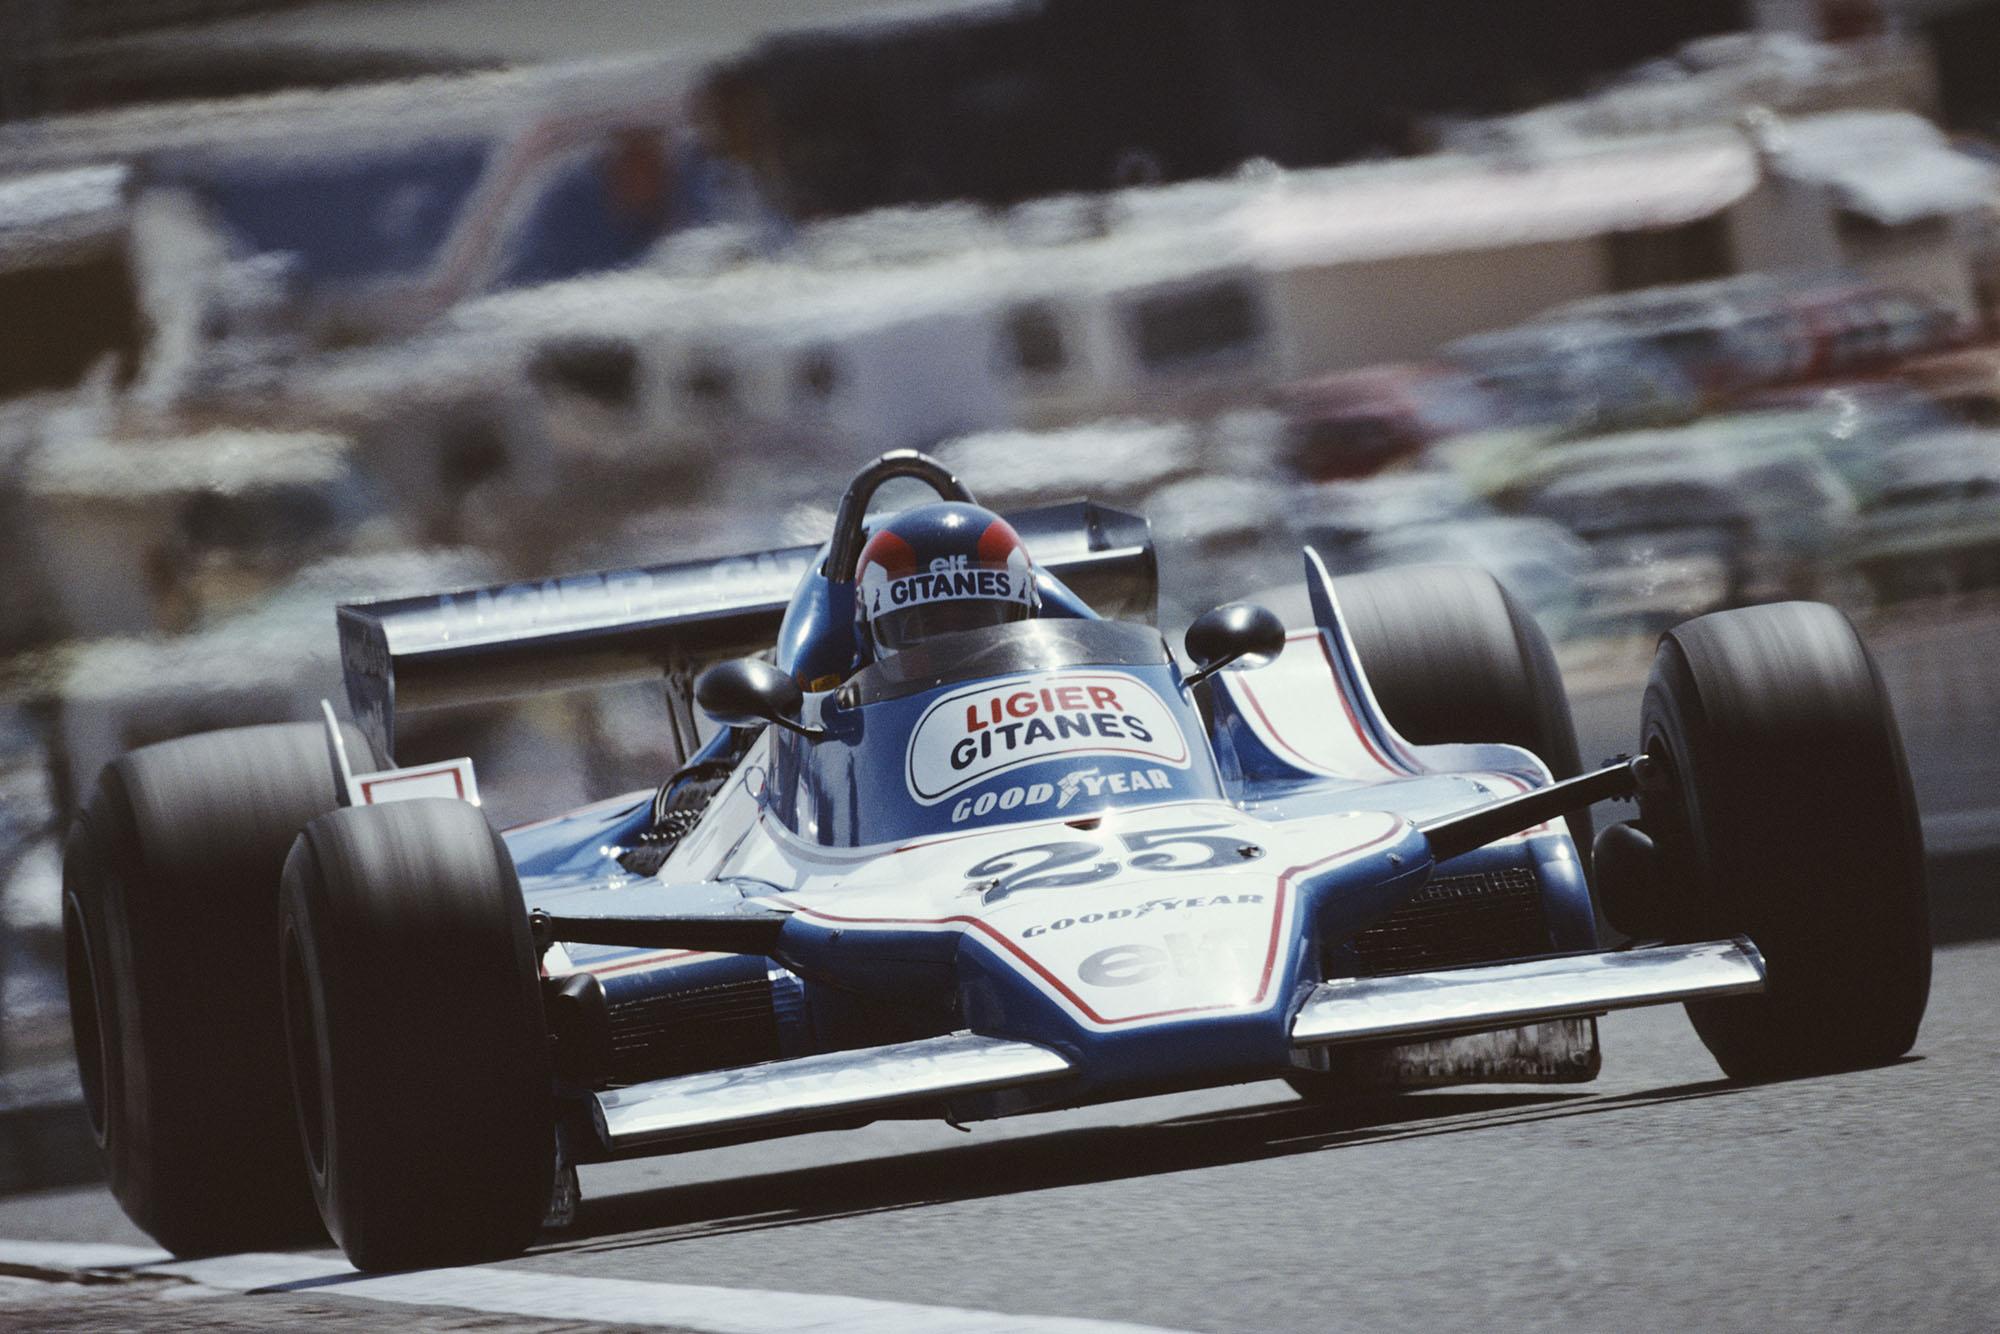 Patrick Depailler (Ligier) driving at the 1979 Spanish Grand Prix, Jarama.